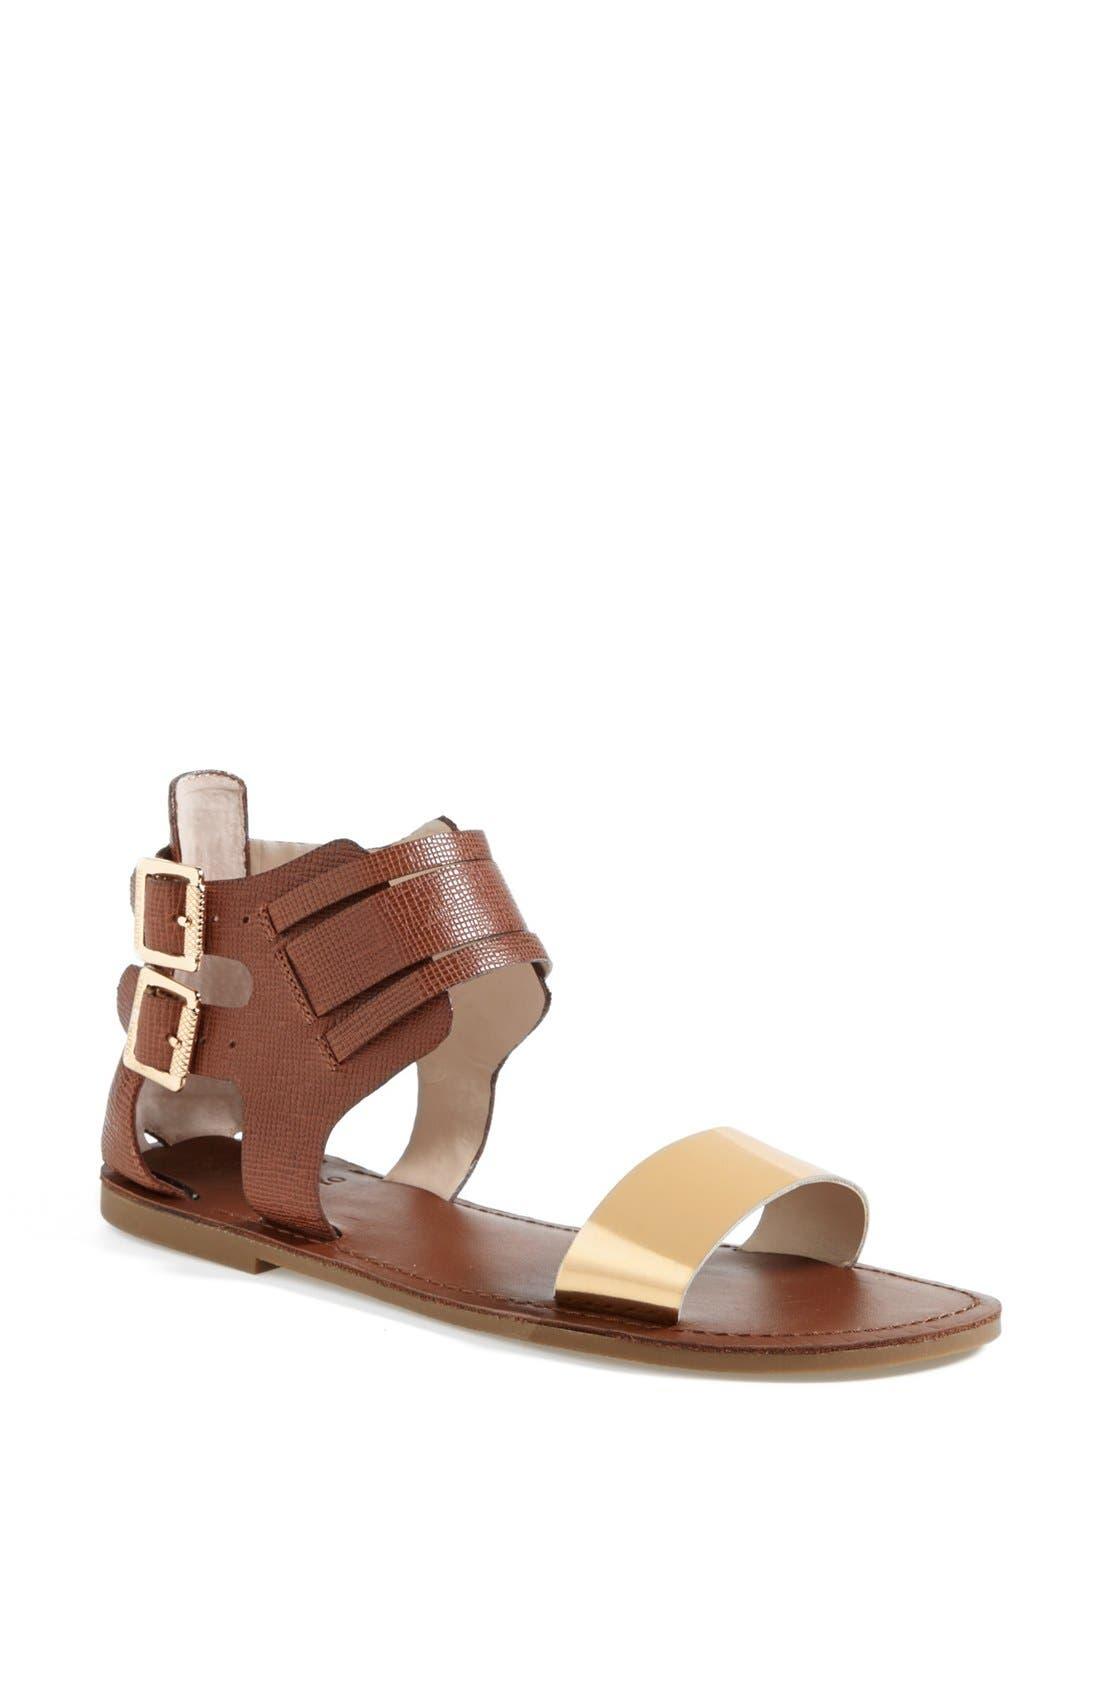 Main Image - Vince Camuto 'Irkeno' Leather Sandal